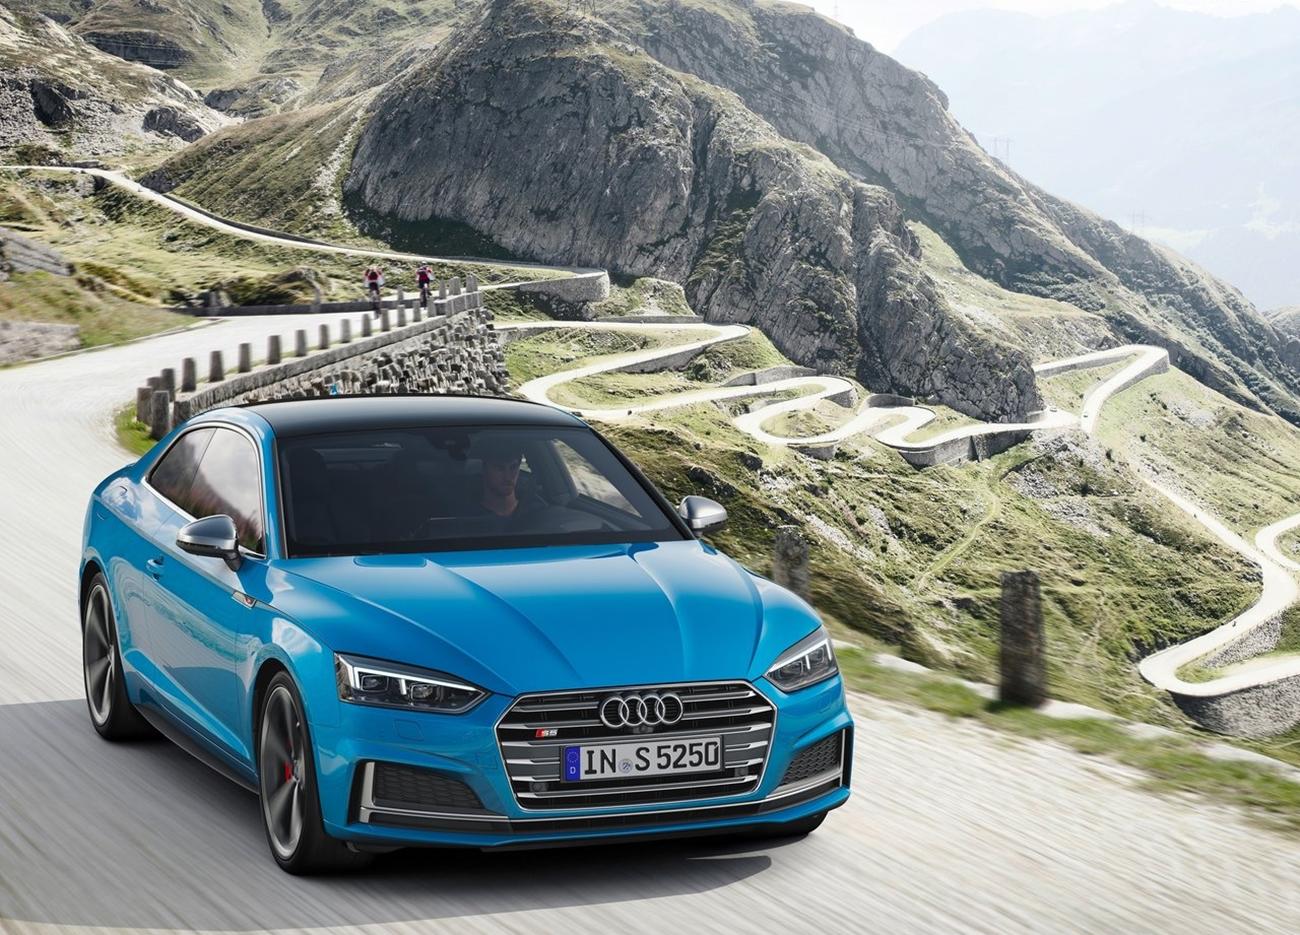 Audi S Tdi Mild Hybrid (1)